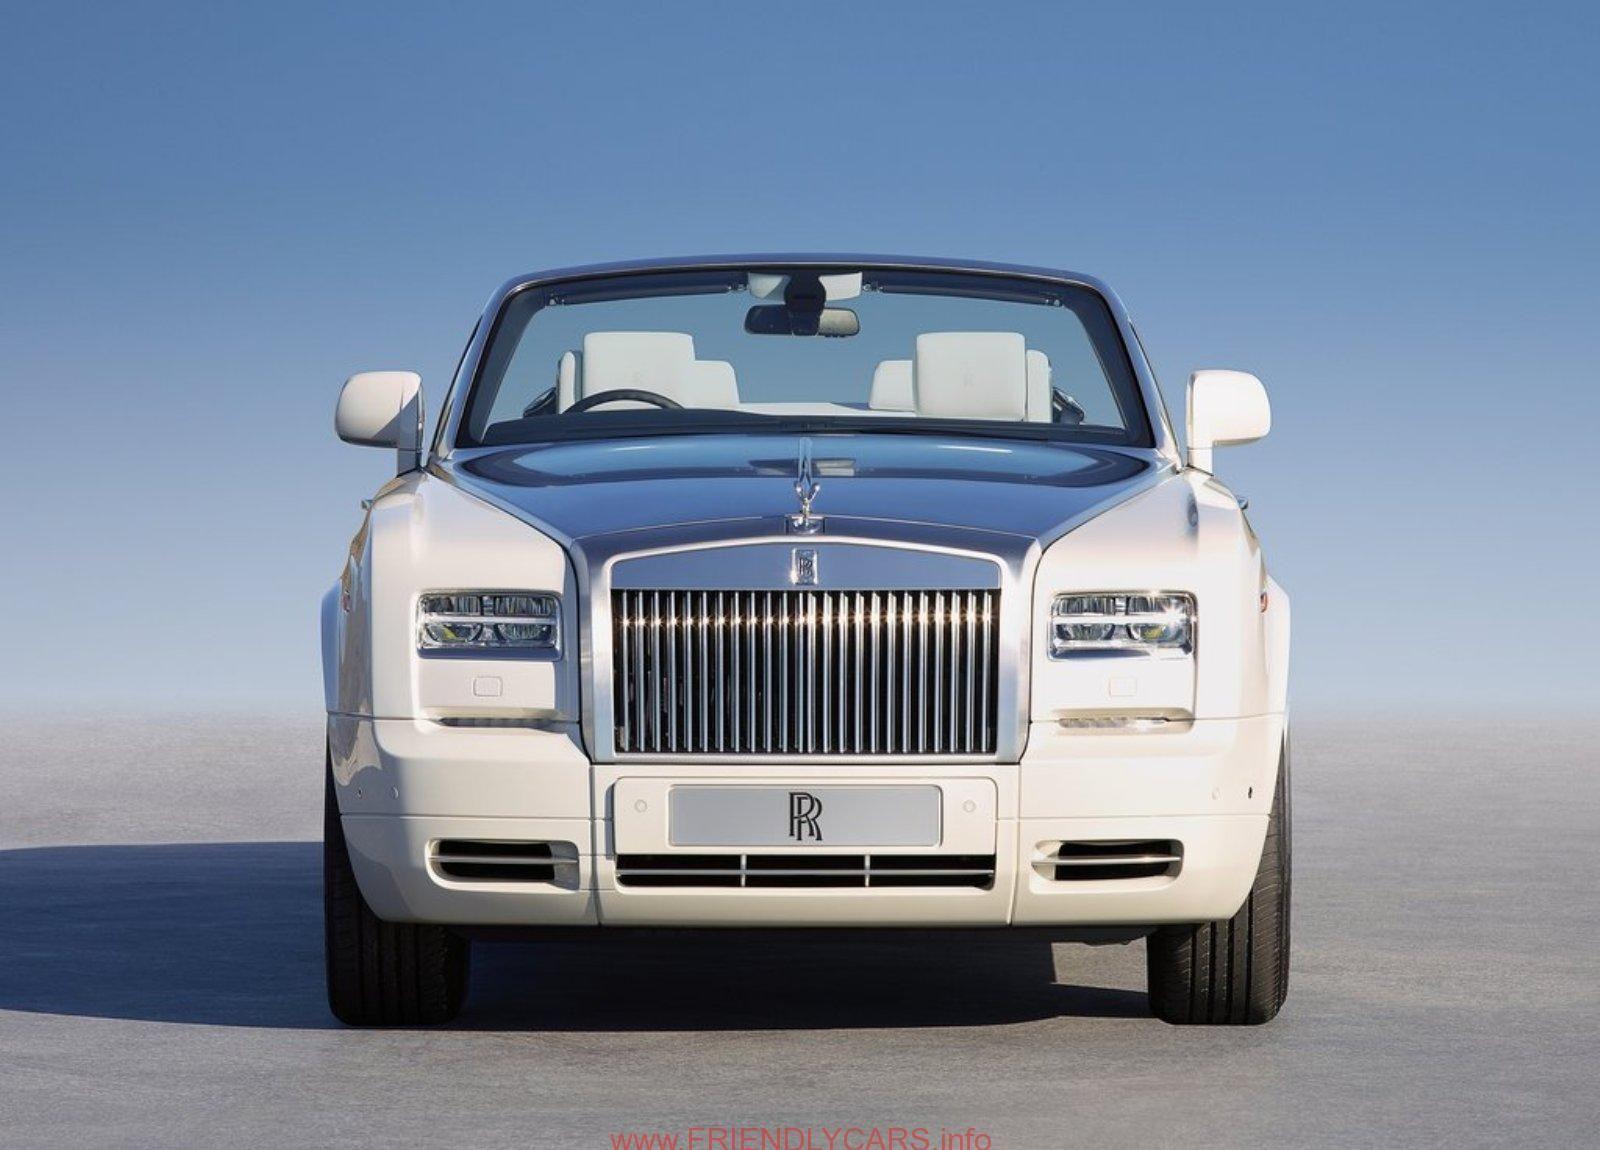 Nice 2014 Rolls Royce Phantom Drophead Coupe Car Images Hd 2013 Rolls Royce Phantom Drophead Coupe Mobil Baru Mobil